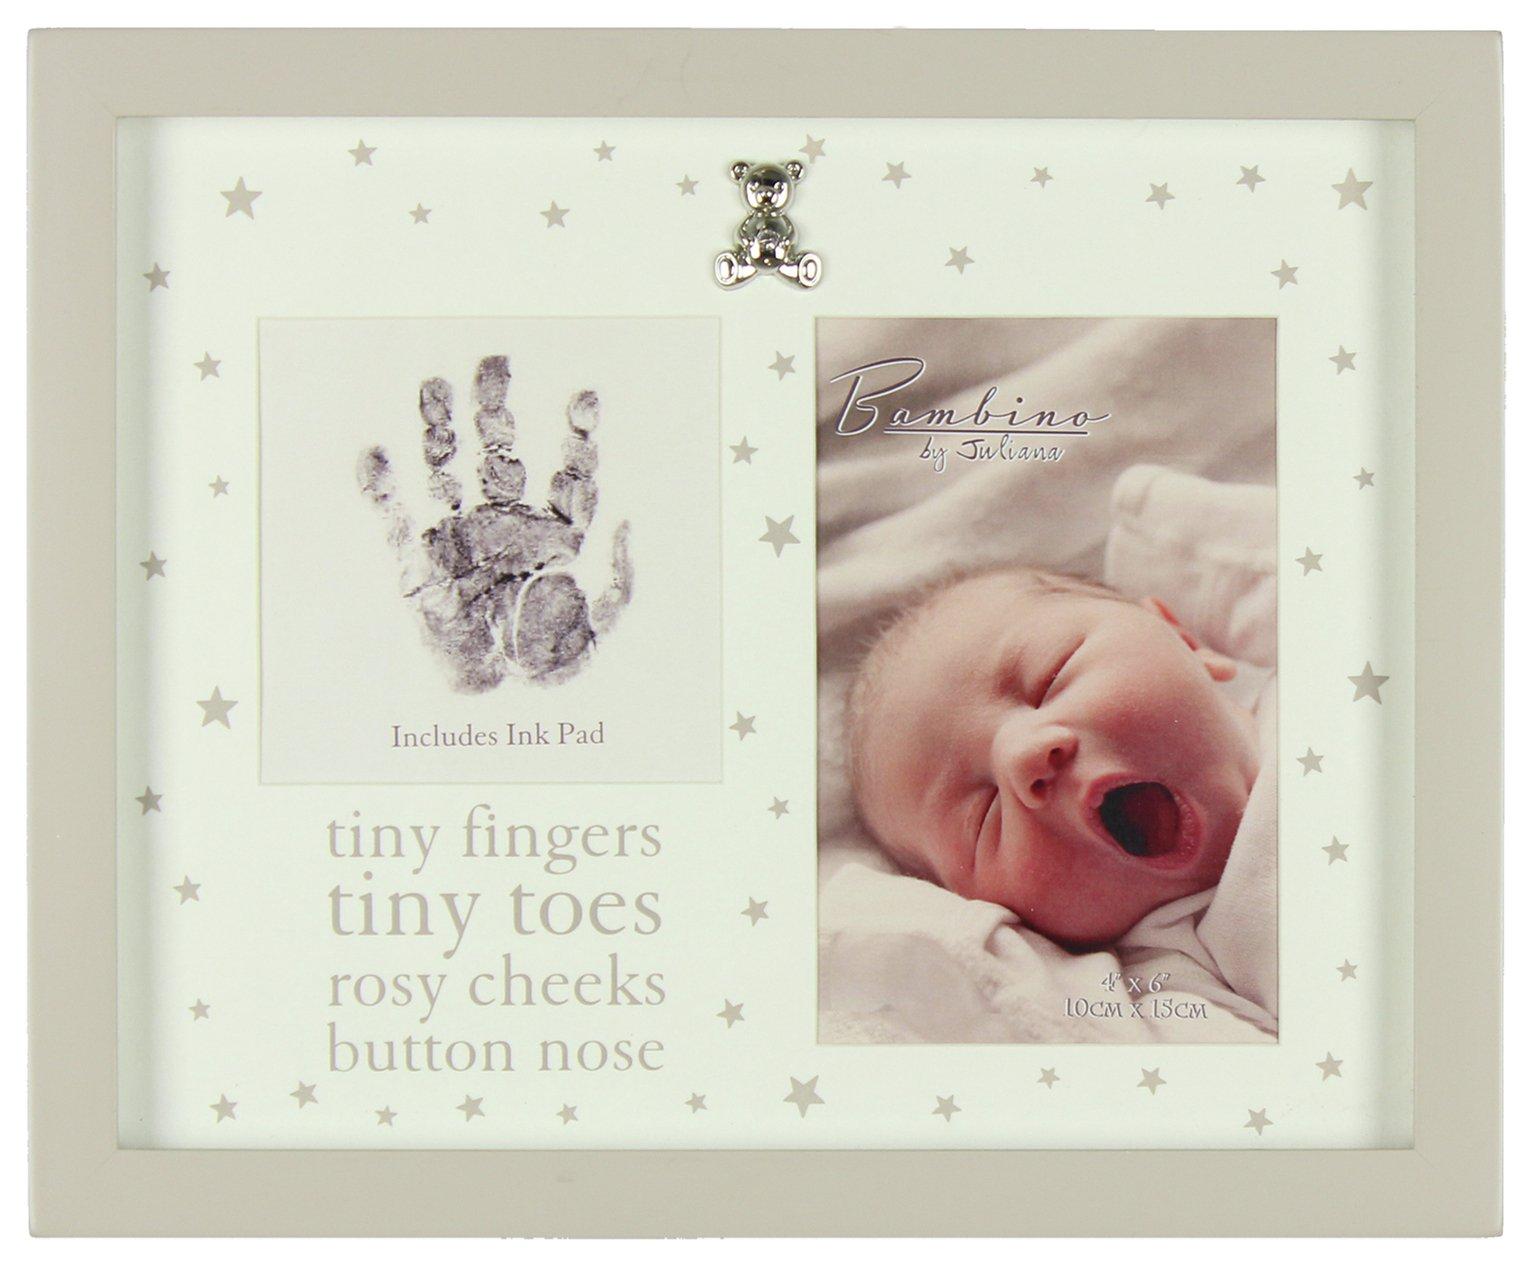 Bambino Hand Print and Photo Frame